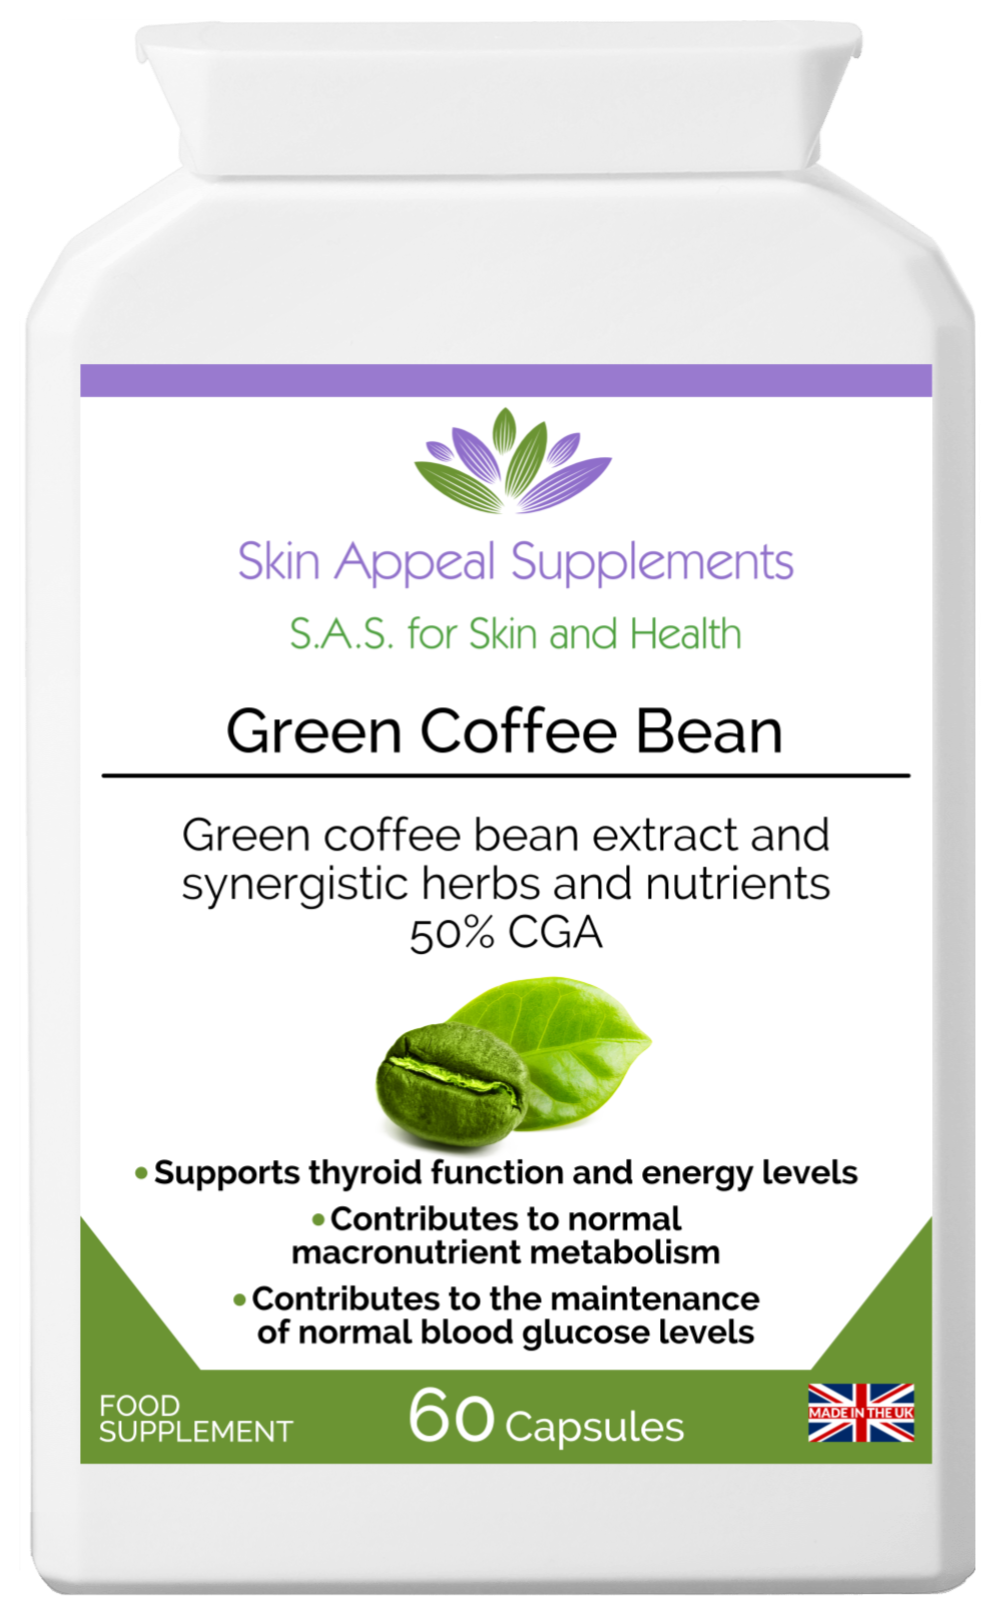 Green Coffee Bean Skin Appeal Supplements